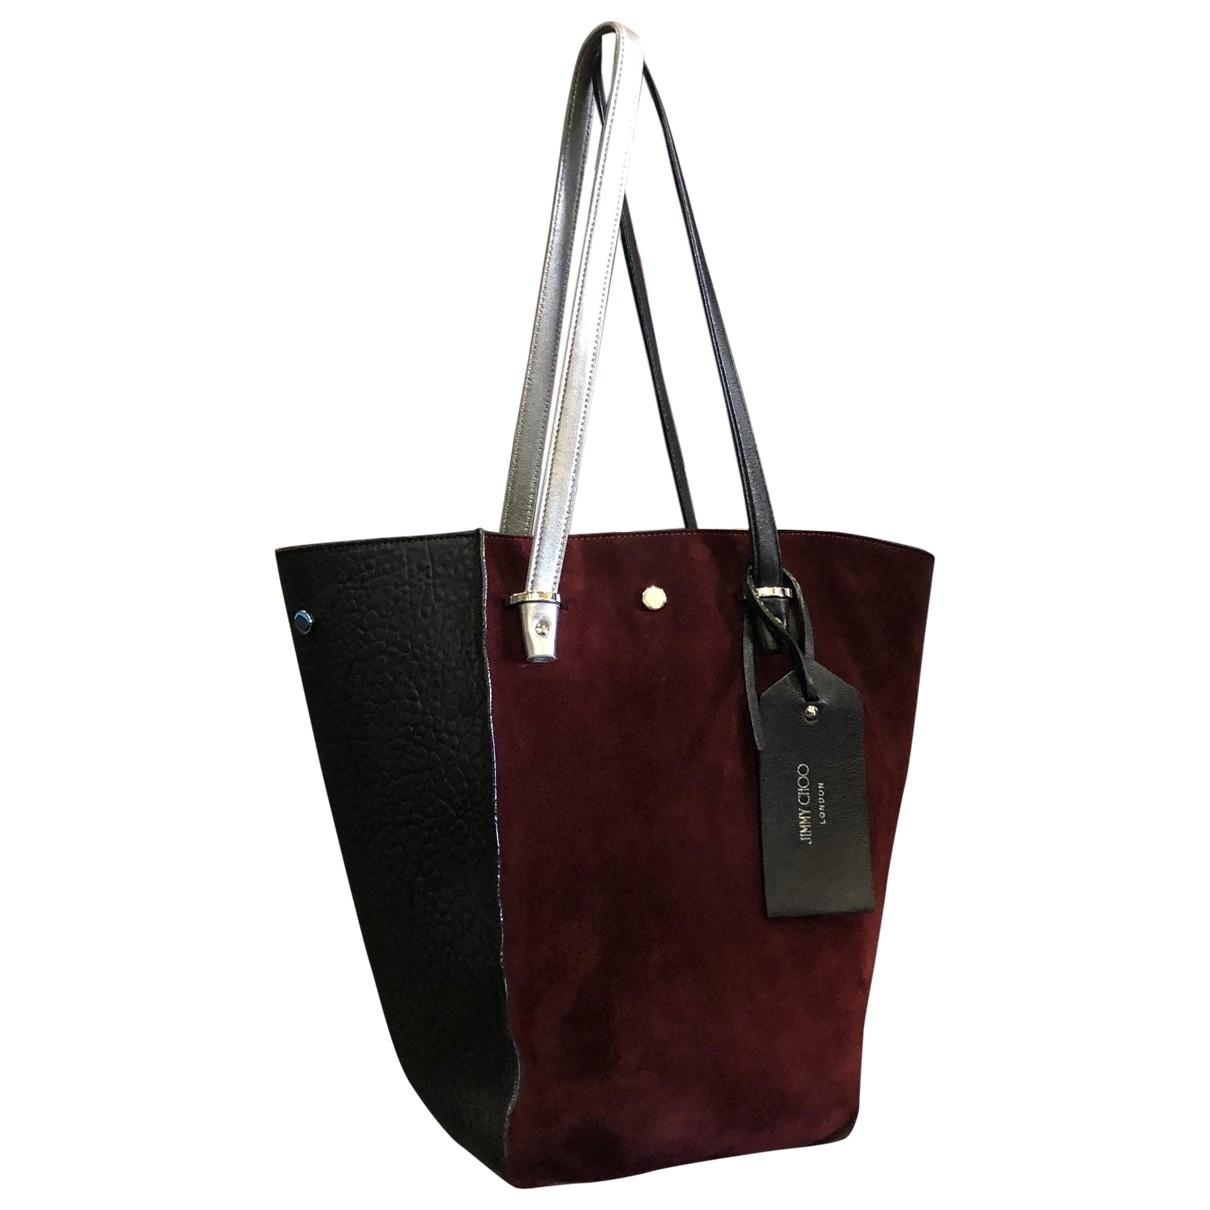 Jimmy Choo \N Handtasche in  Bordeauxrot Veloursleder